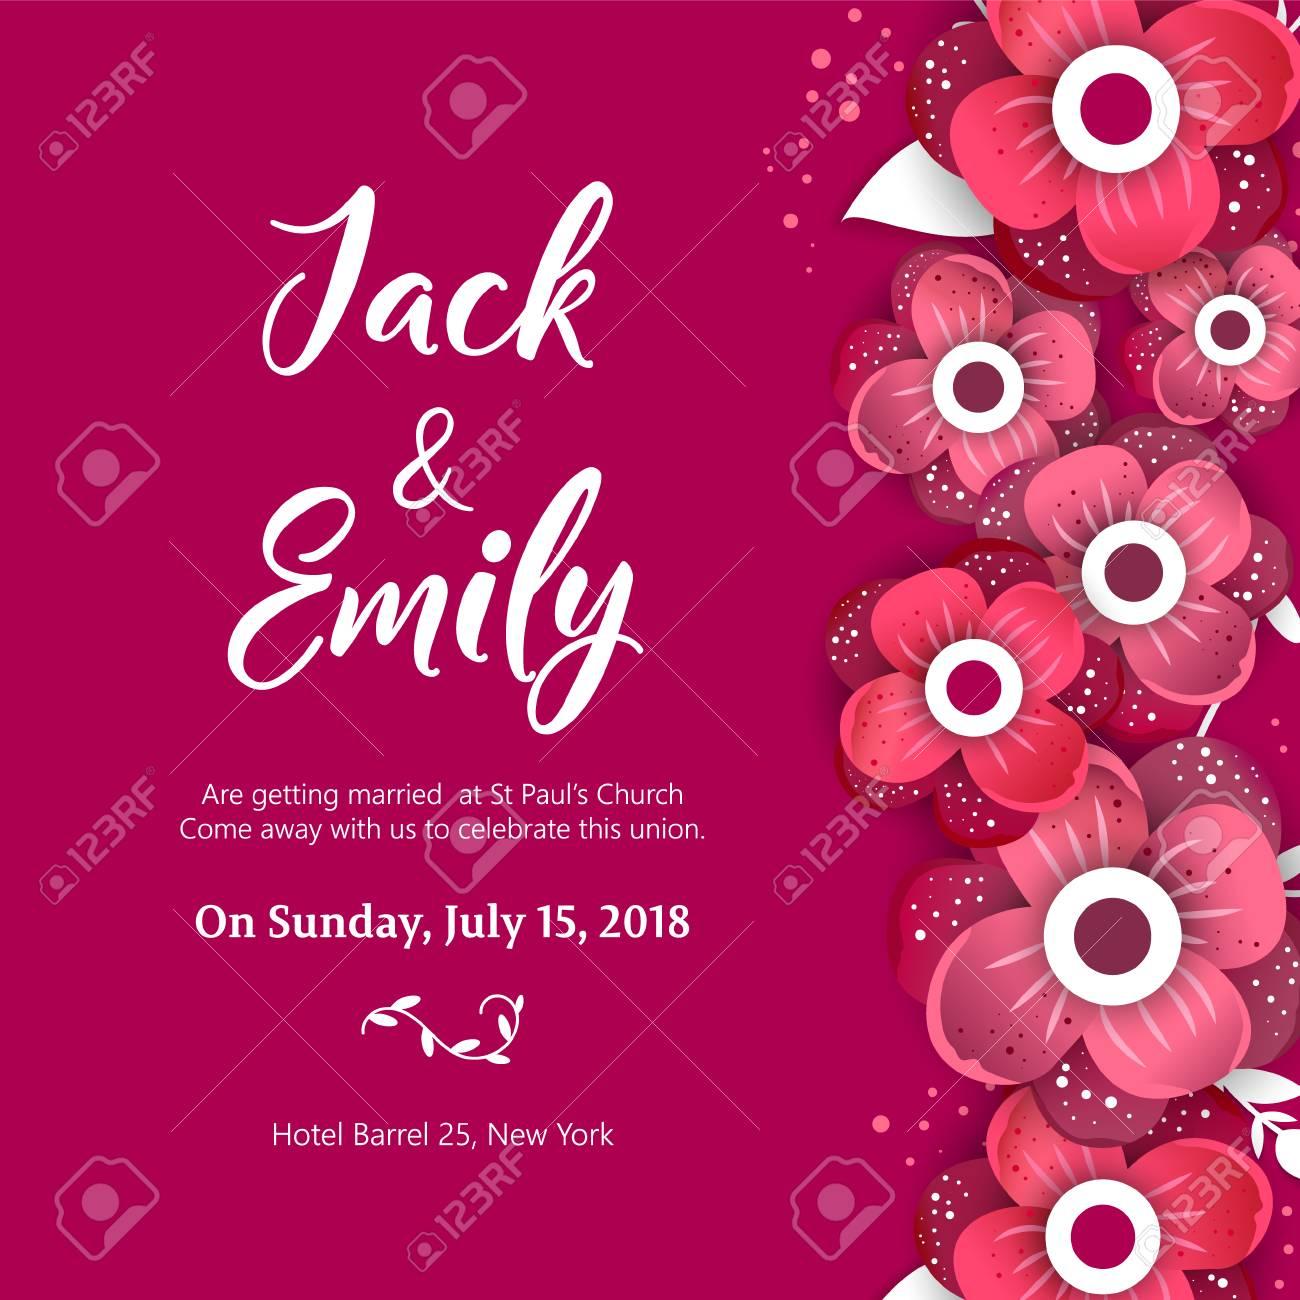 Wedding Invitation, Floral Invite Card Design Wedding Invite.. Royalty Free  Cliparts, Vectors, And Stock Illustration. Image 95968938.